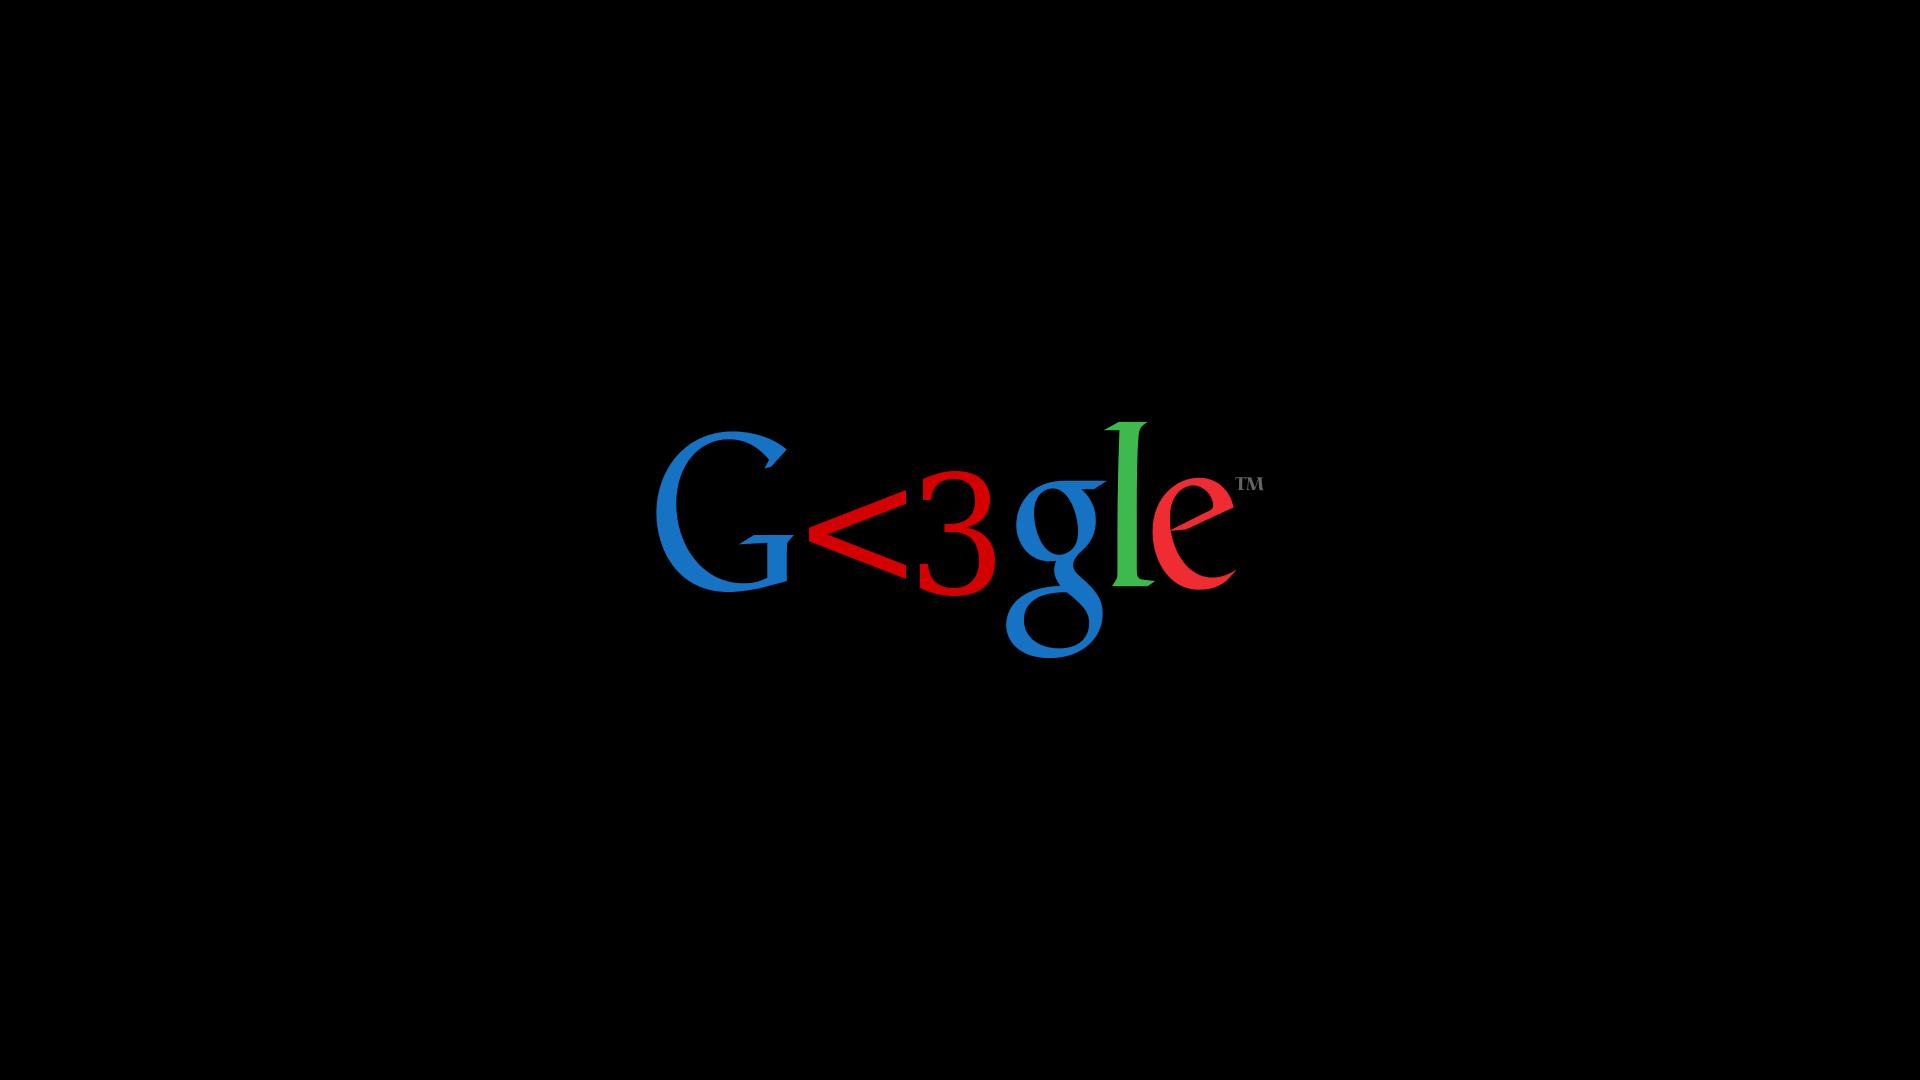 Google themes themebeta - Google Themes Themebeta 55